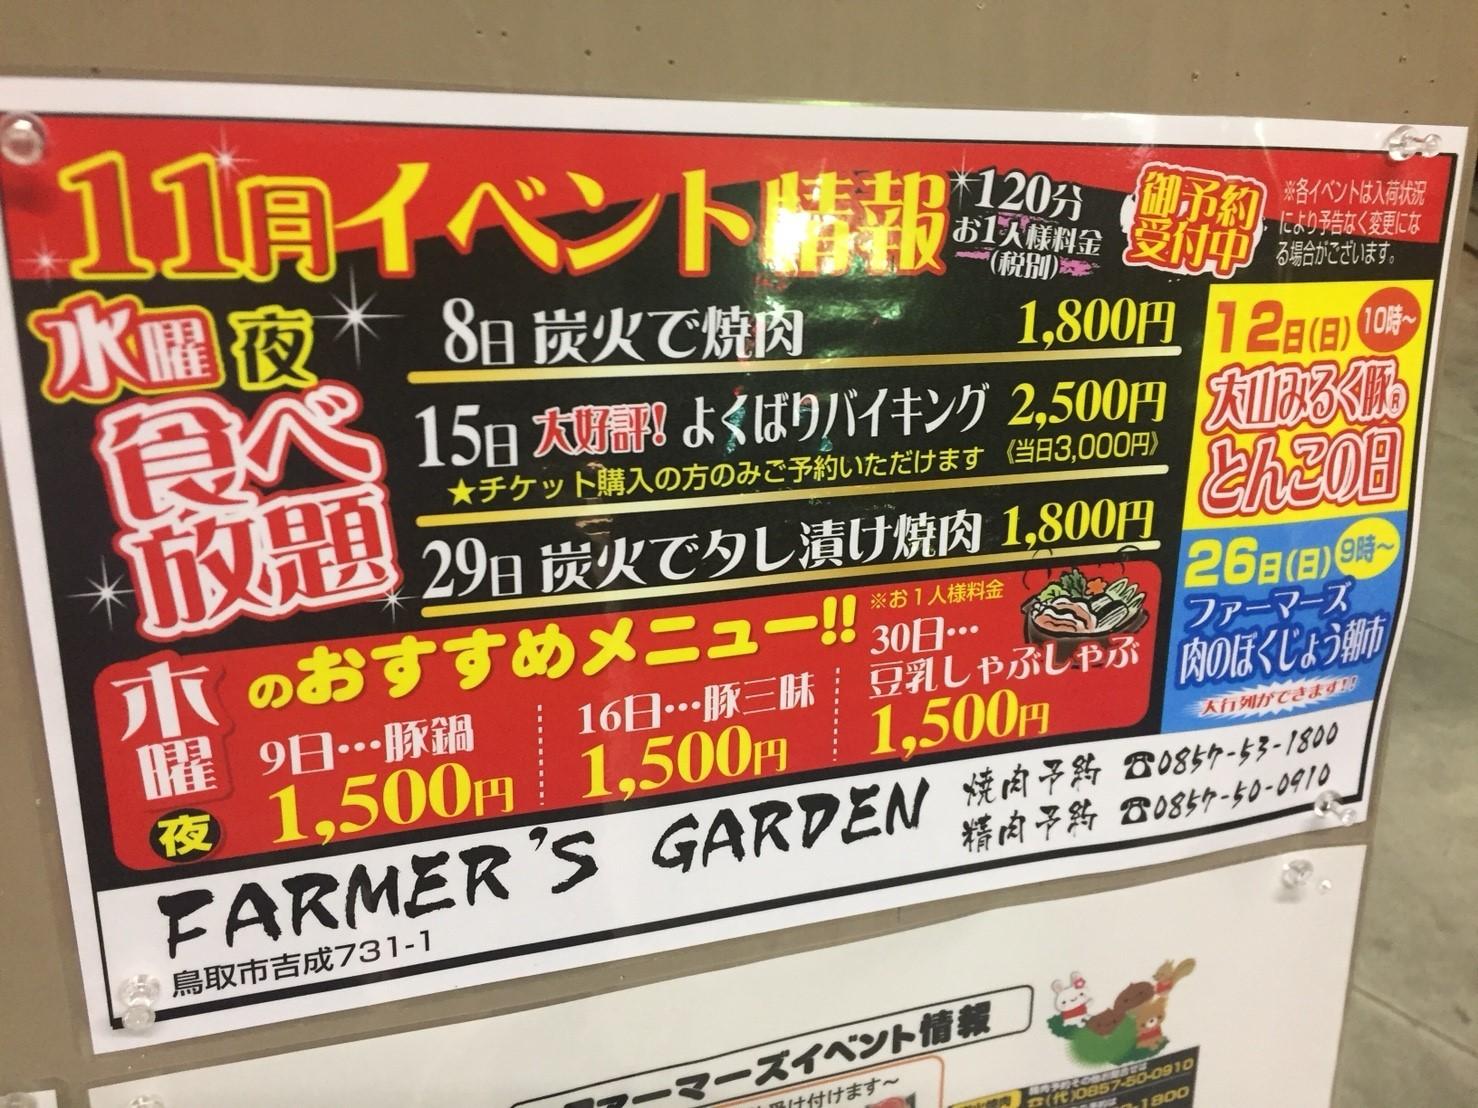 FARMAR\'S GARDEN 食べ放題新企画_e0115904_05093337.jpg